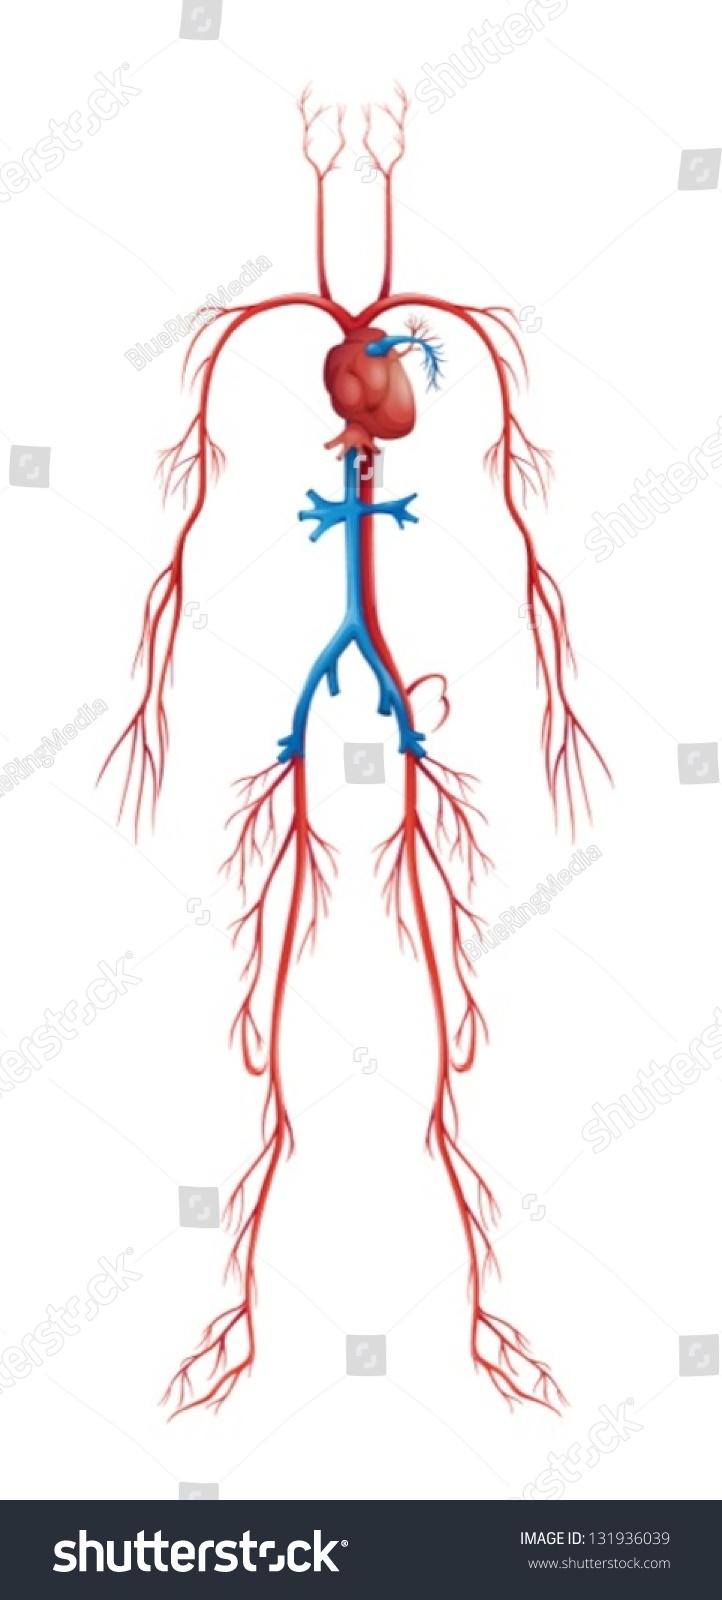 Illustration Isolated Human Circulatory System Stock Vector 131936039  Shutterstock